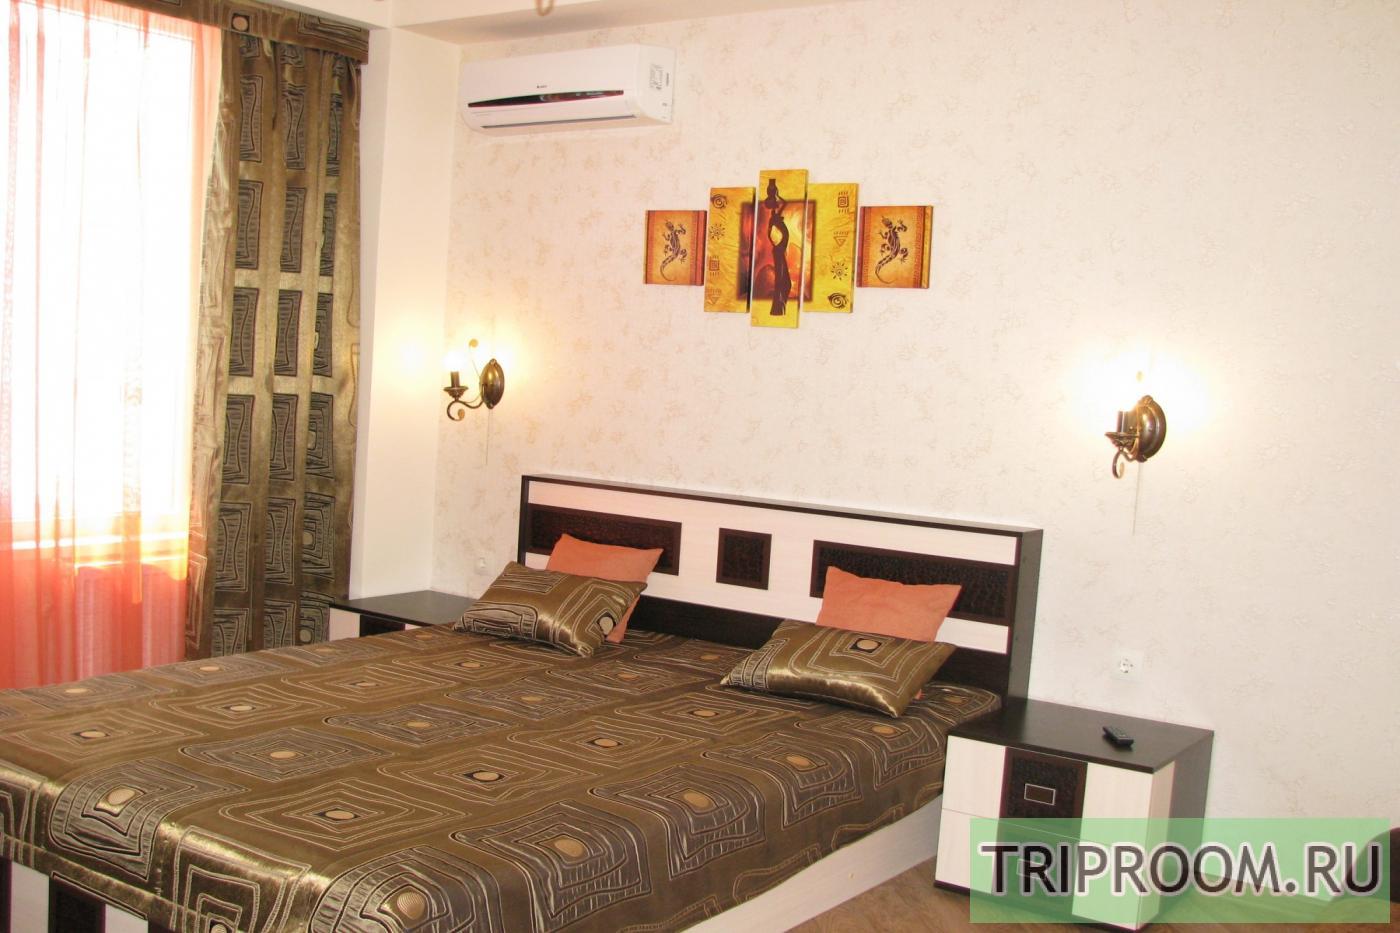 1-комнатная квартира посуточно (вариант № 34740), ул. Репина улица, фото № 2